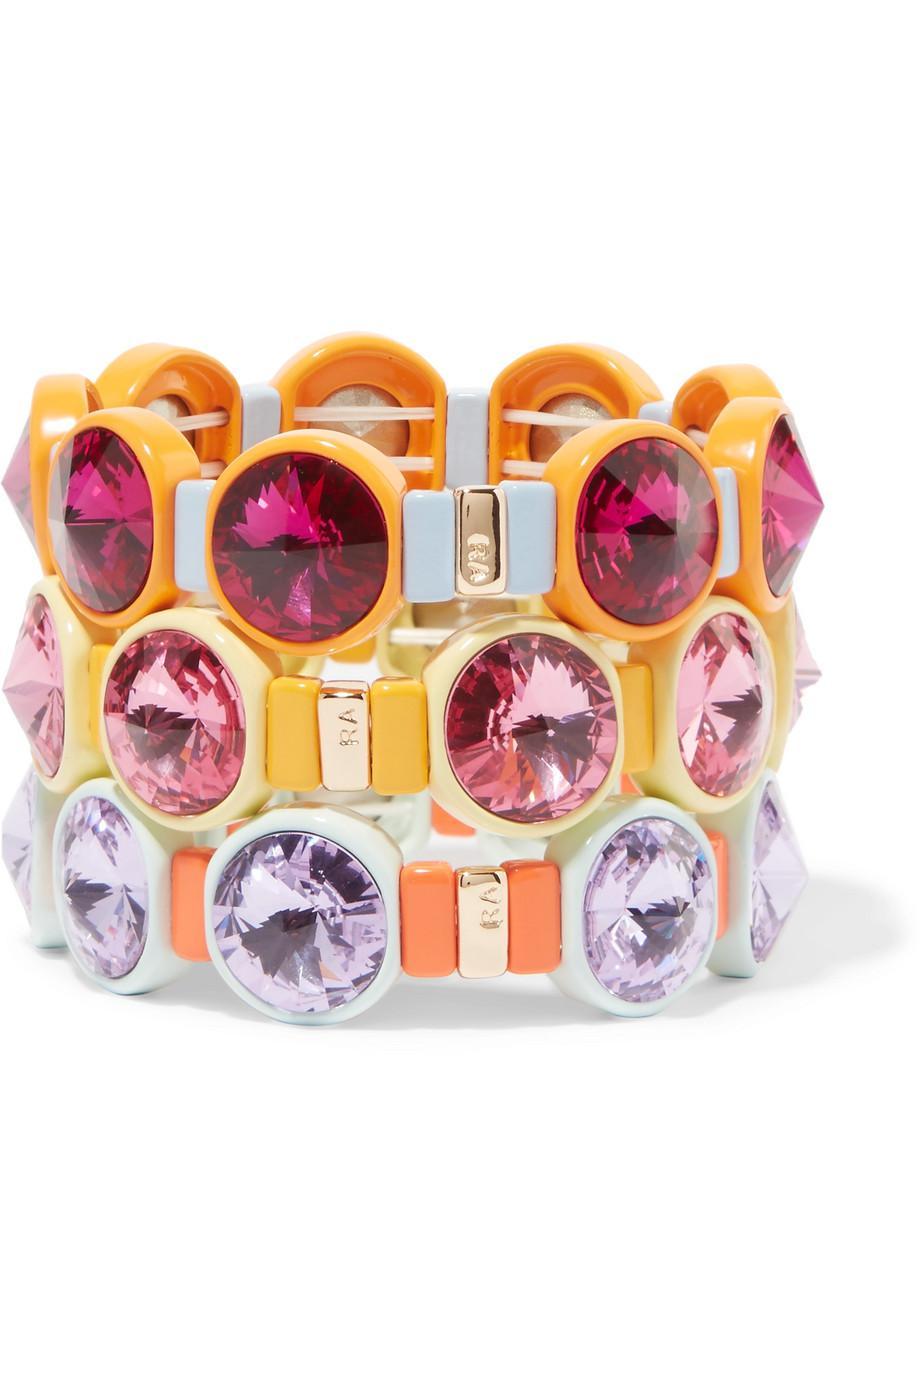 Technicolor Set Of Three Enamel And Swarovski Crystal Bracelets - Pink Roxanne Assoulin oZOWkd9